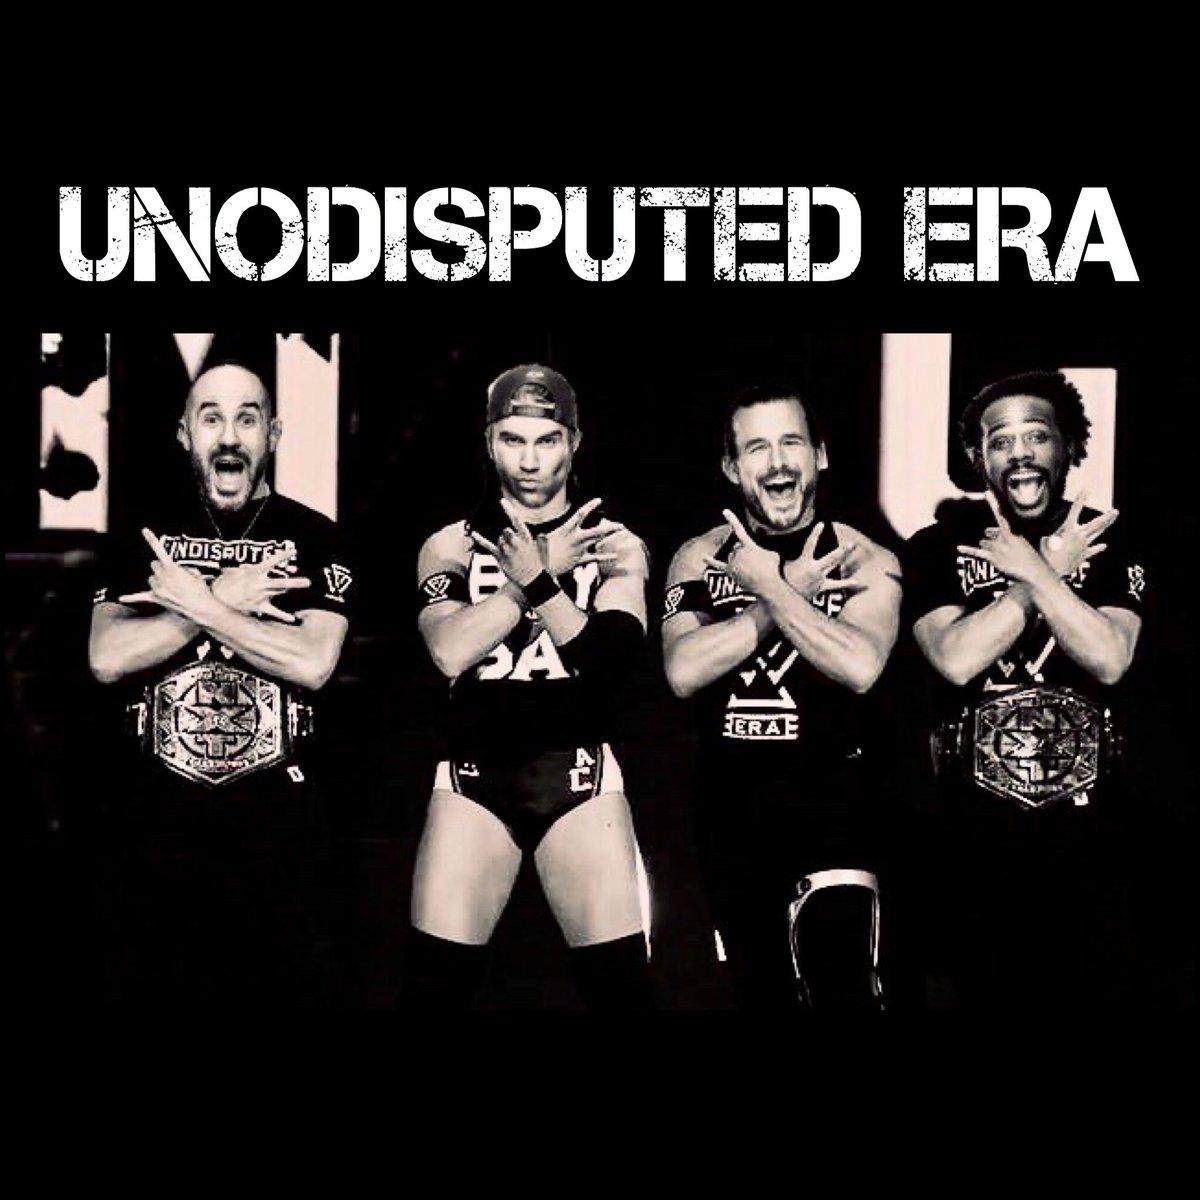 Hey @UpUpDwnDwn you should totally make these shirts on https://t.co/lGtF99m7kw @XavierWoodsPhD @AdamColePro @MmmGorgeous @WWECesaro #uno #daparty #UndisputedERA https://t.co/Jkq1N3KNdN